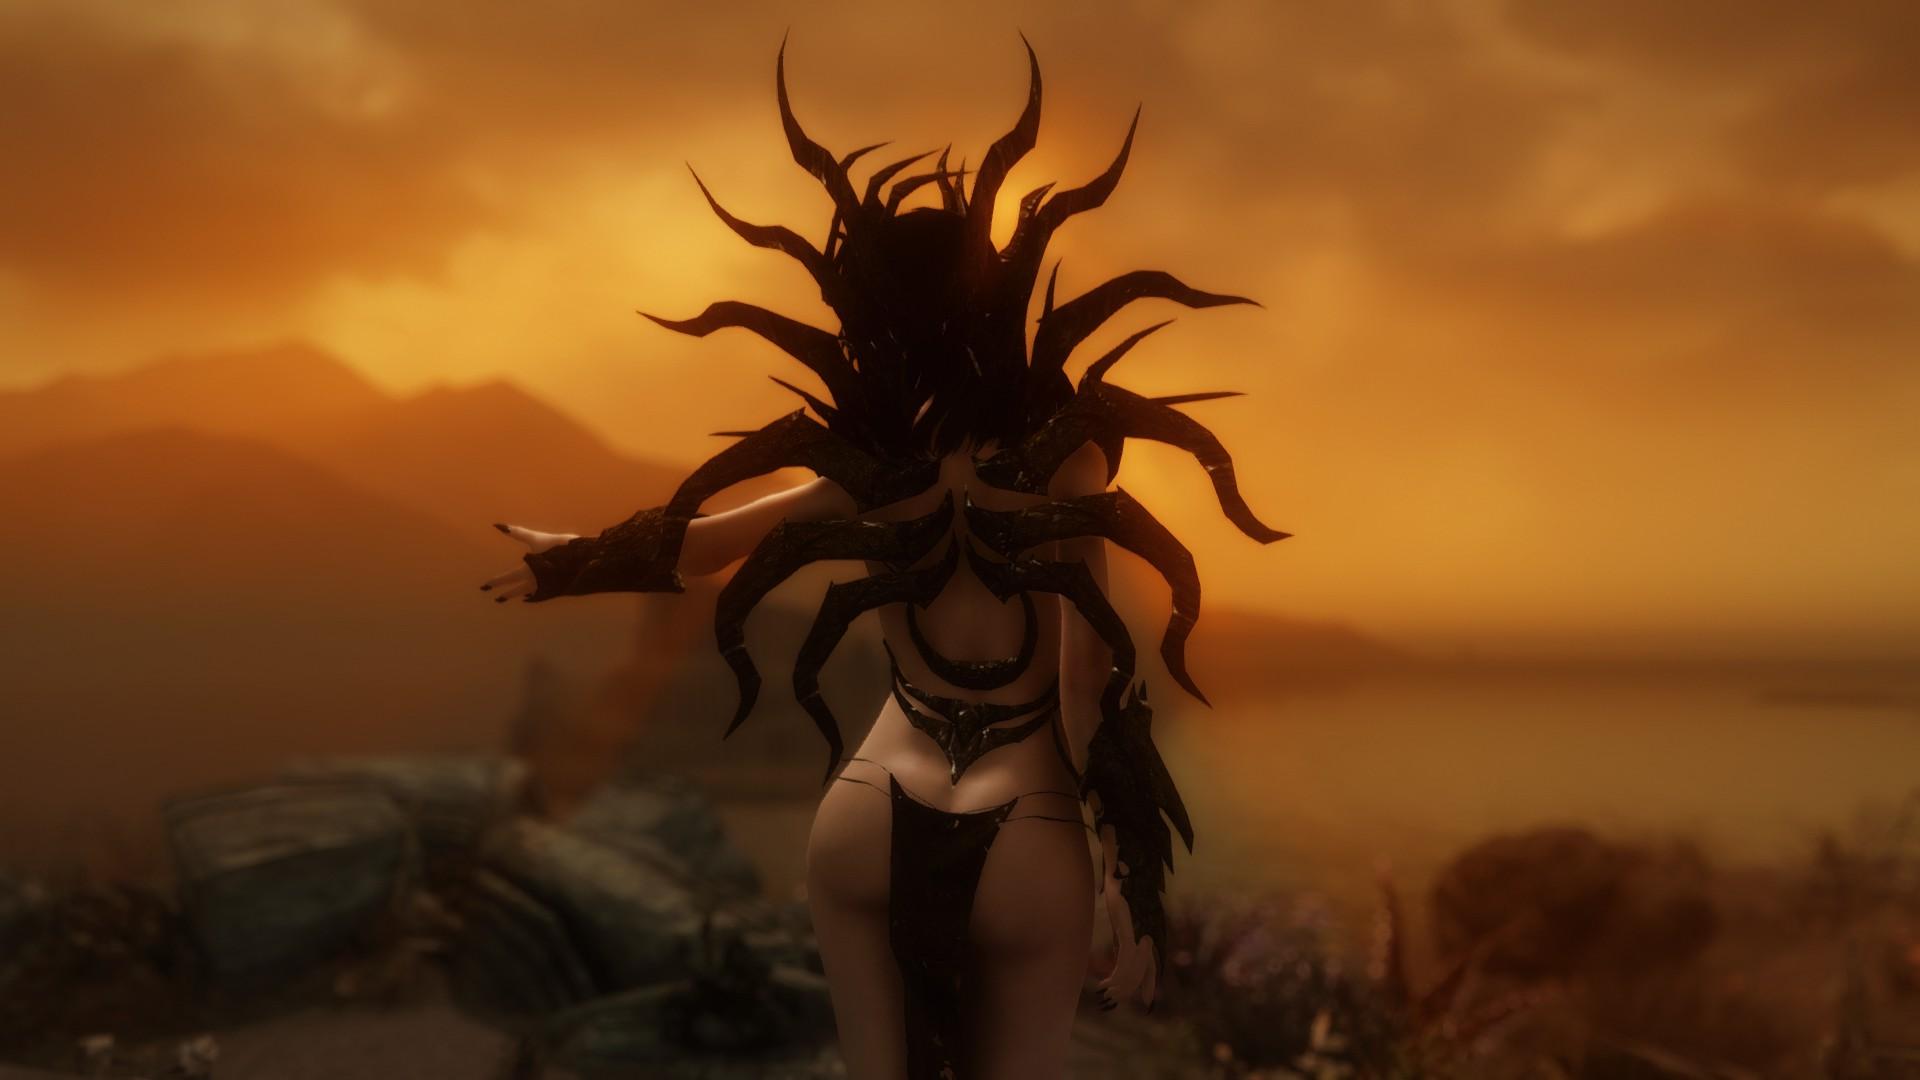 Sky Armor Demon Mythology Mod ENB Cloth Tree Darkness Screenshot Skyrim Computer Wallpaper Mora Mods Solstheim